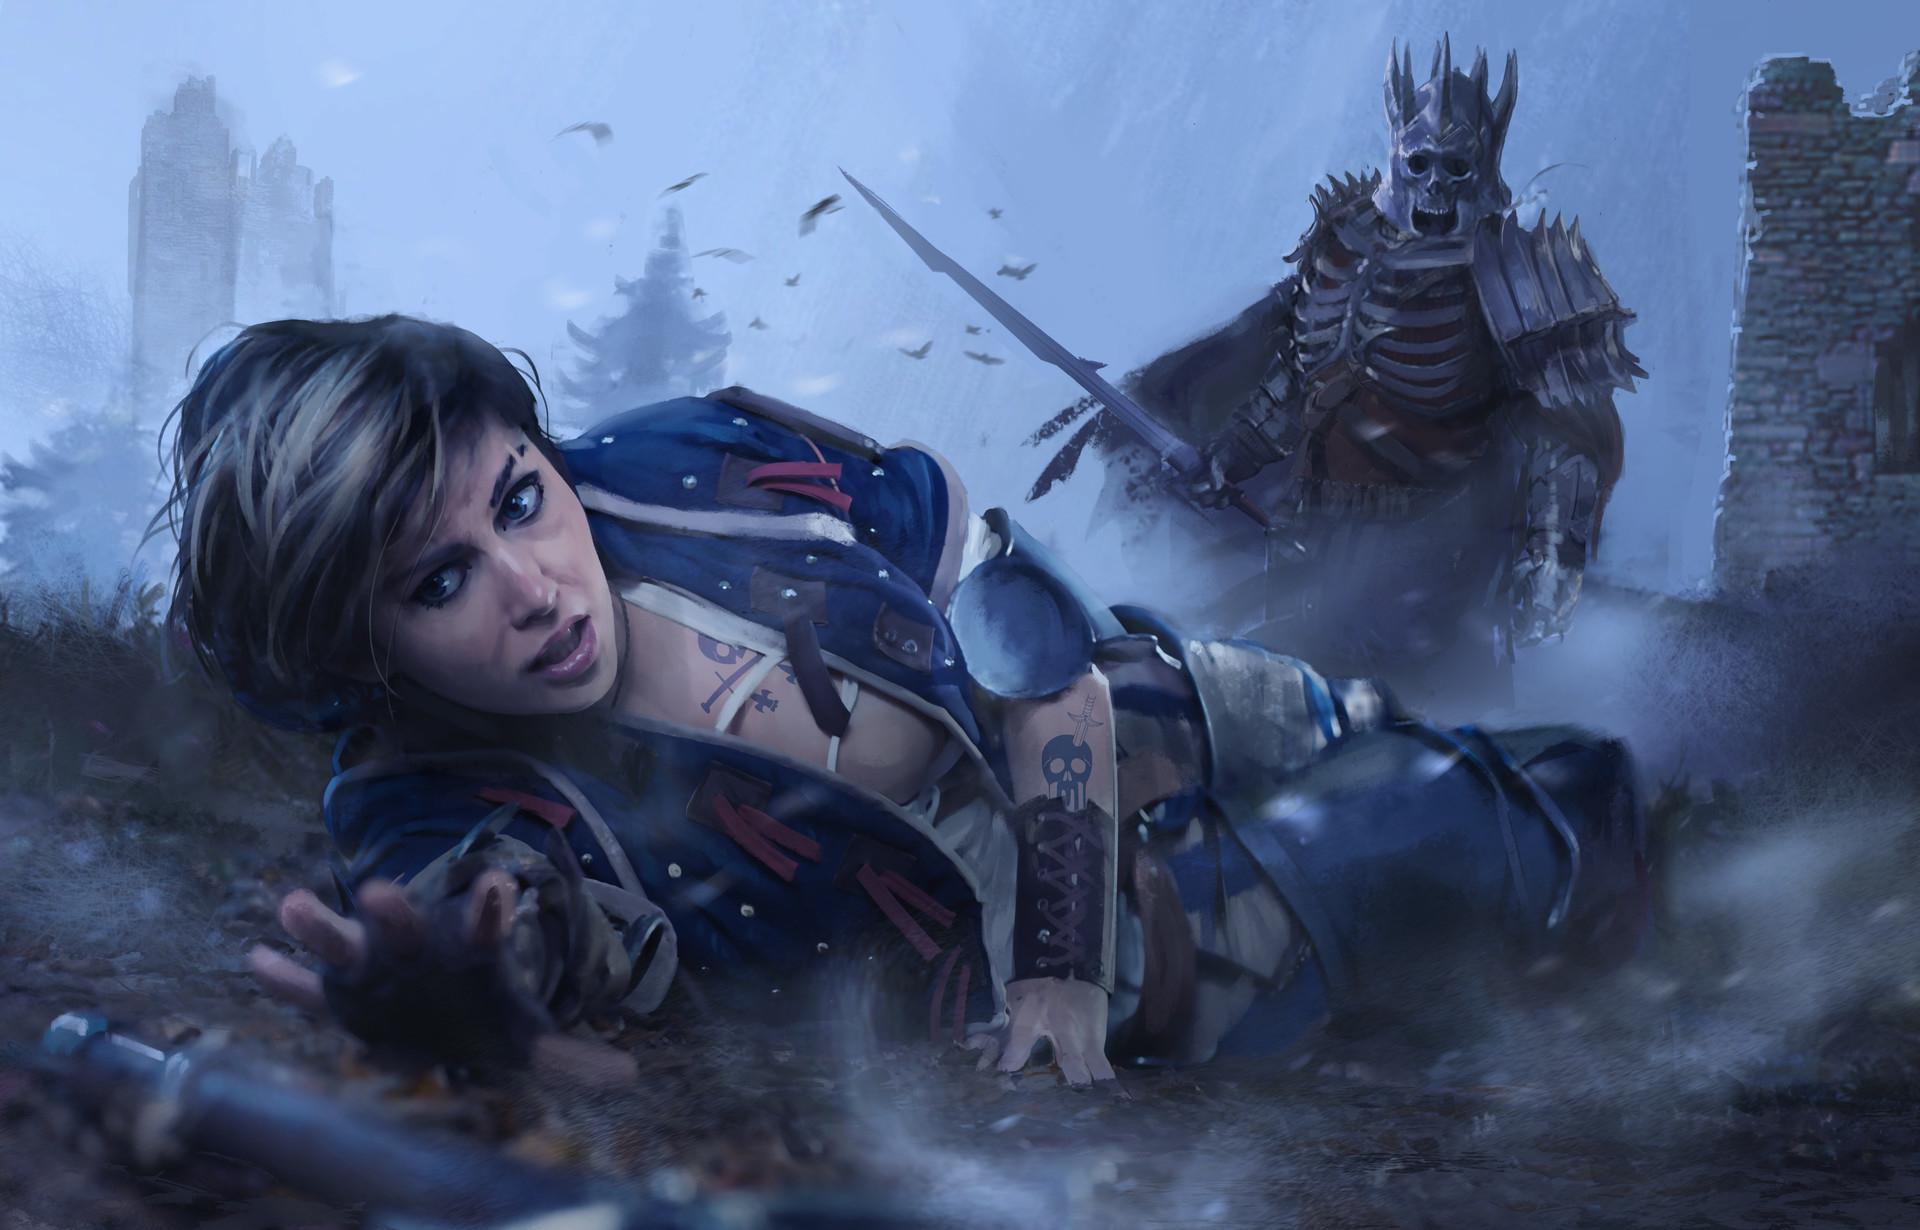 Eredin Bréacc Glas The Witcher 3 Wallpaper Hd Games 4k